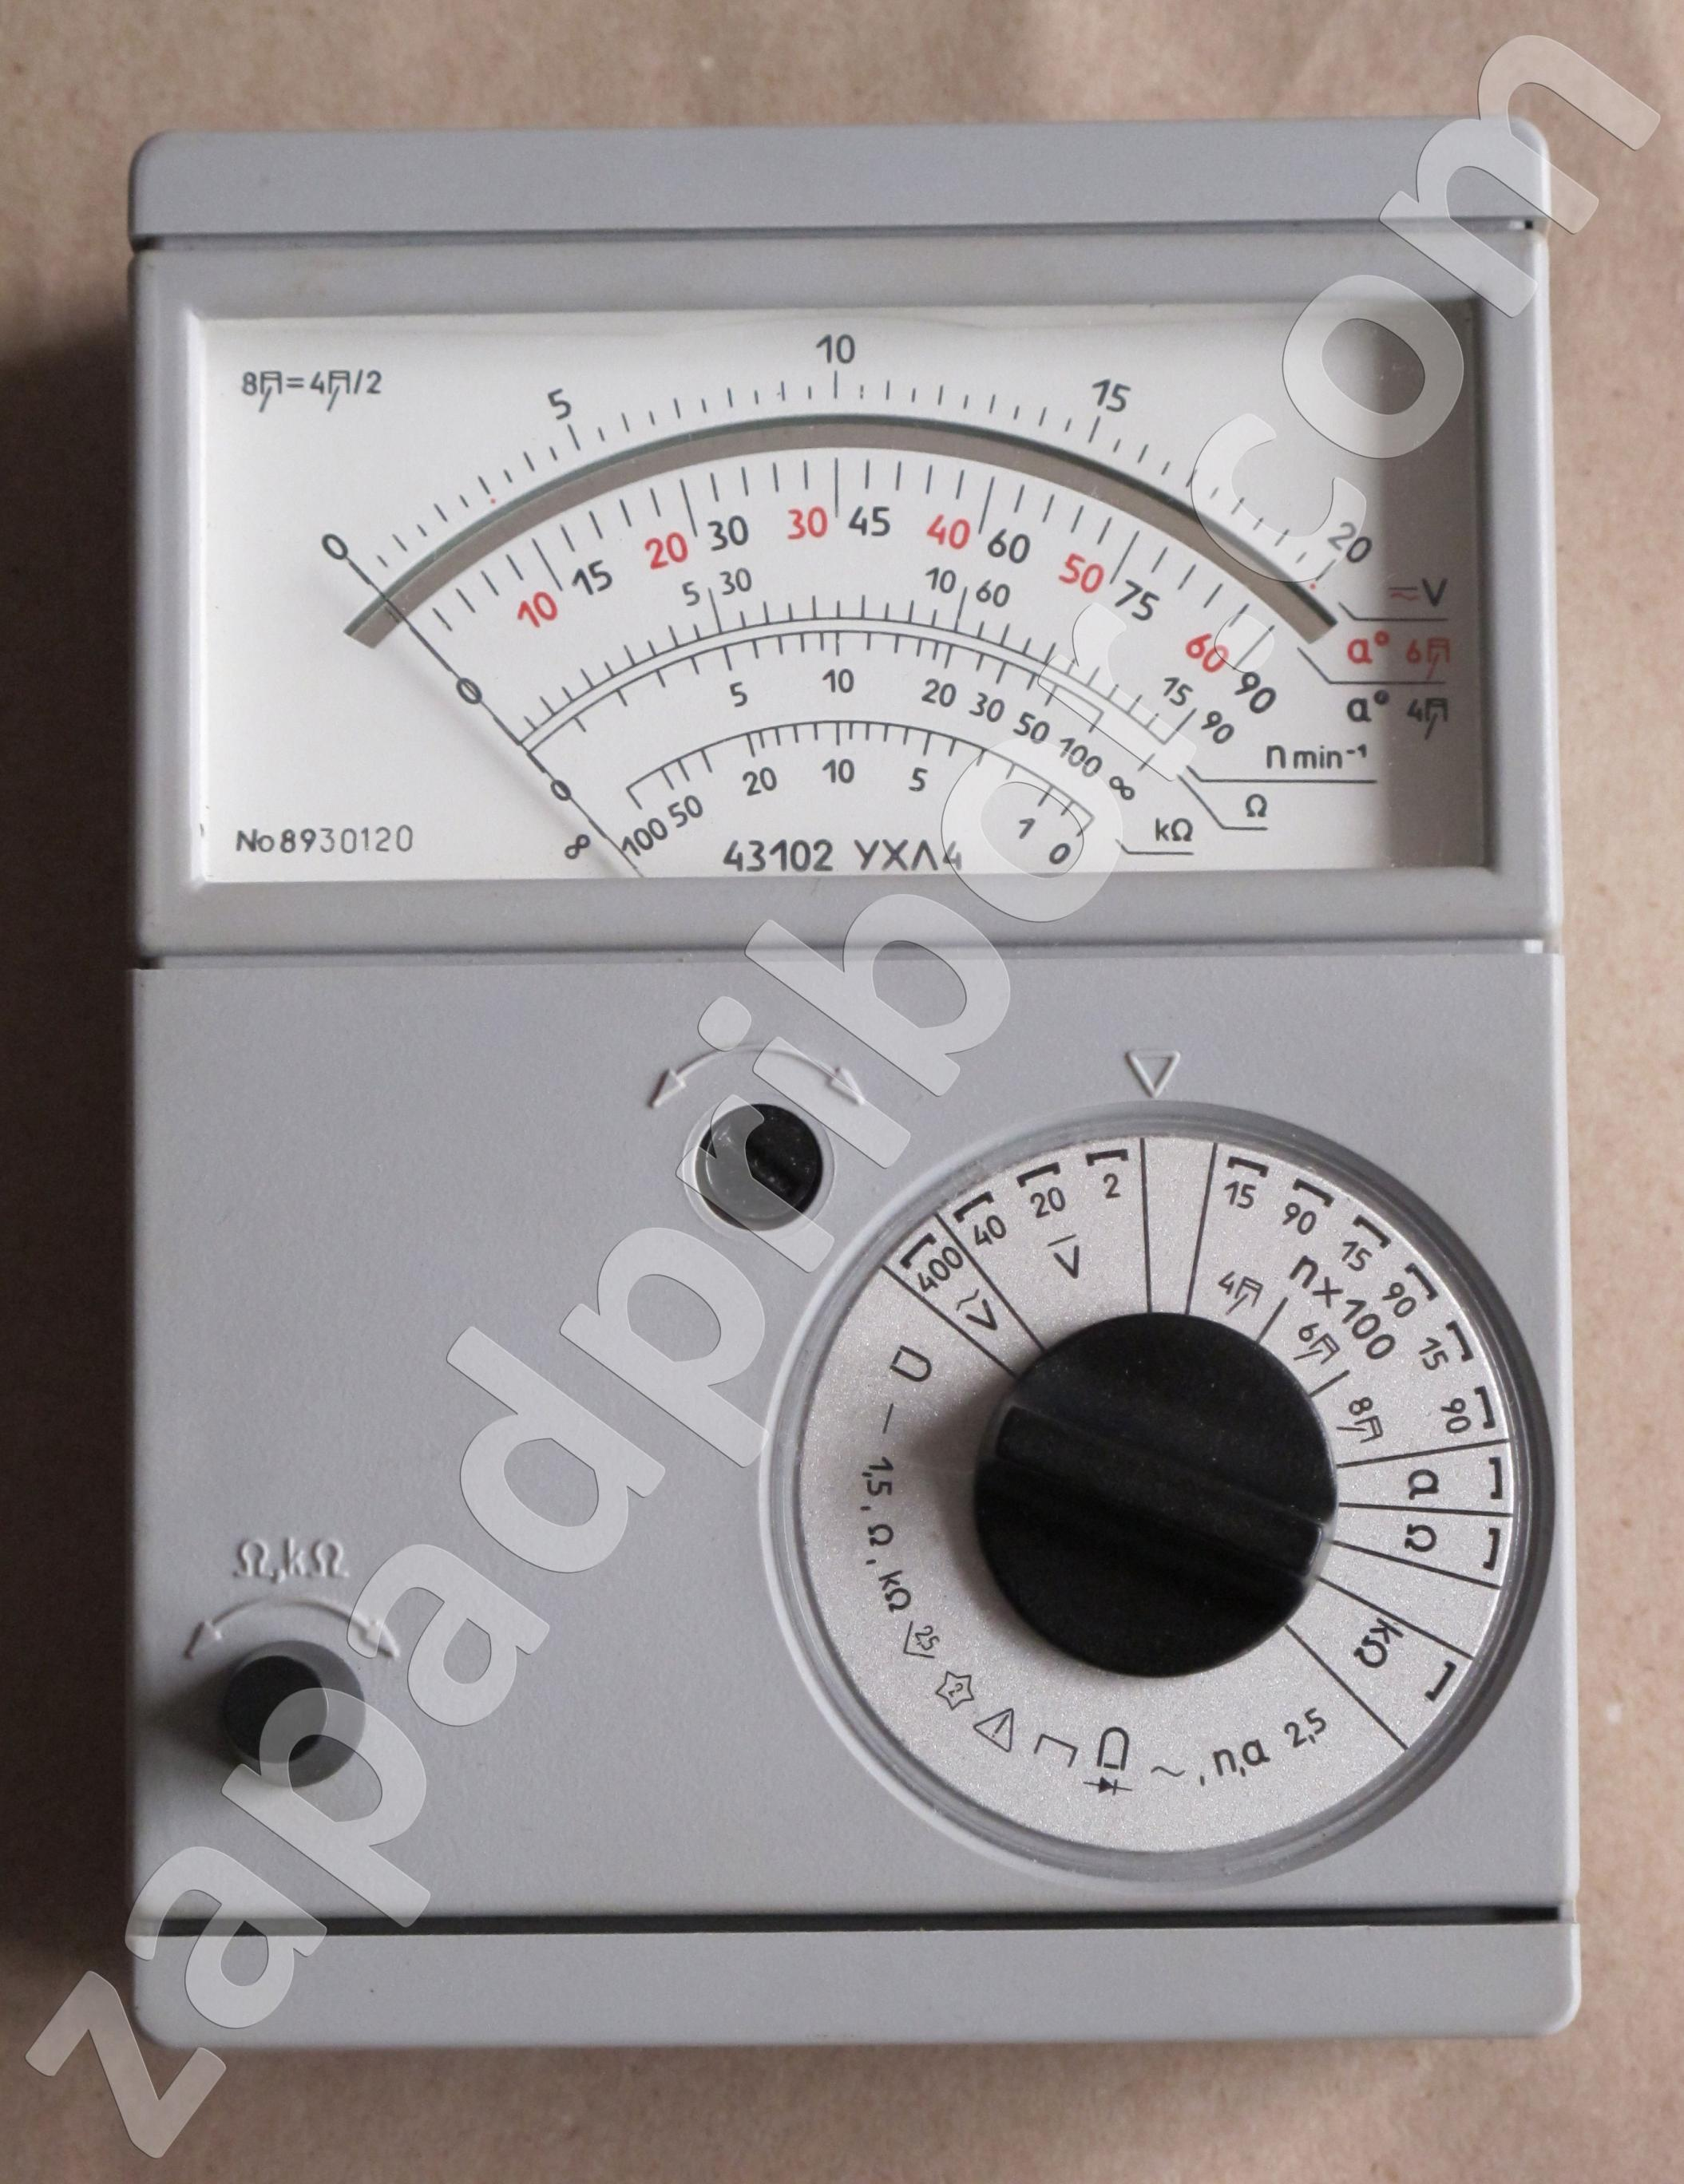 схема прибора ц4353